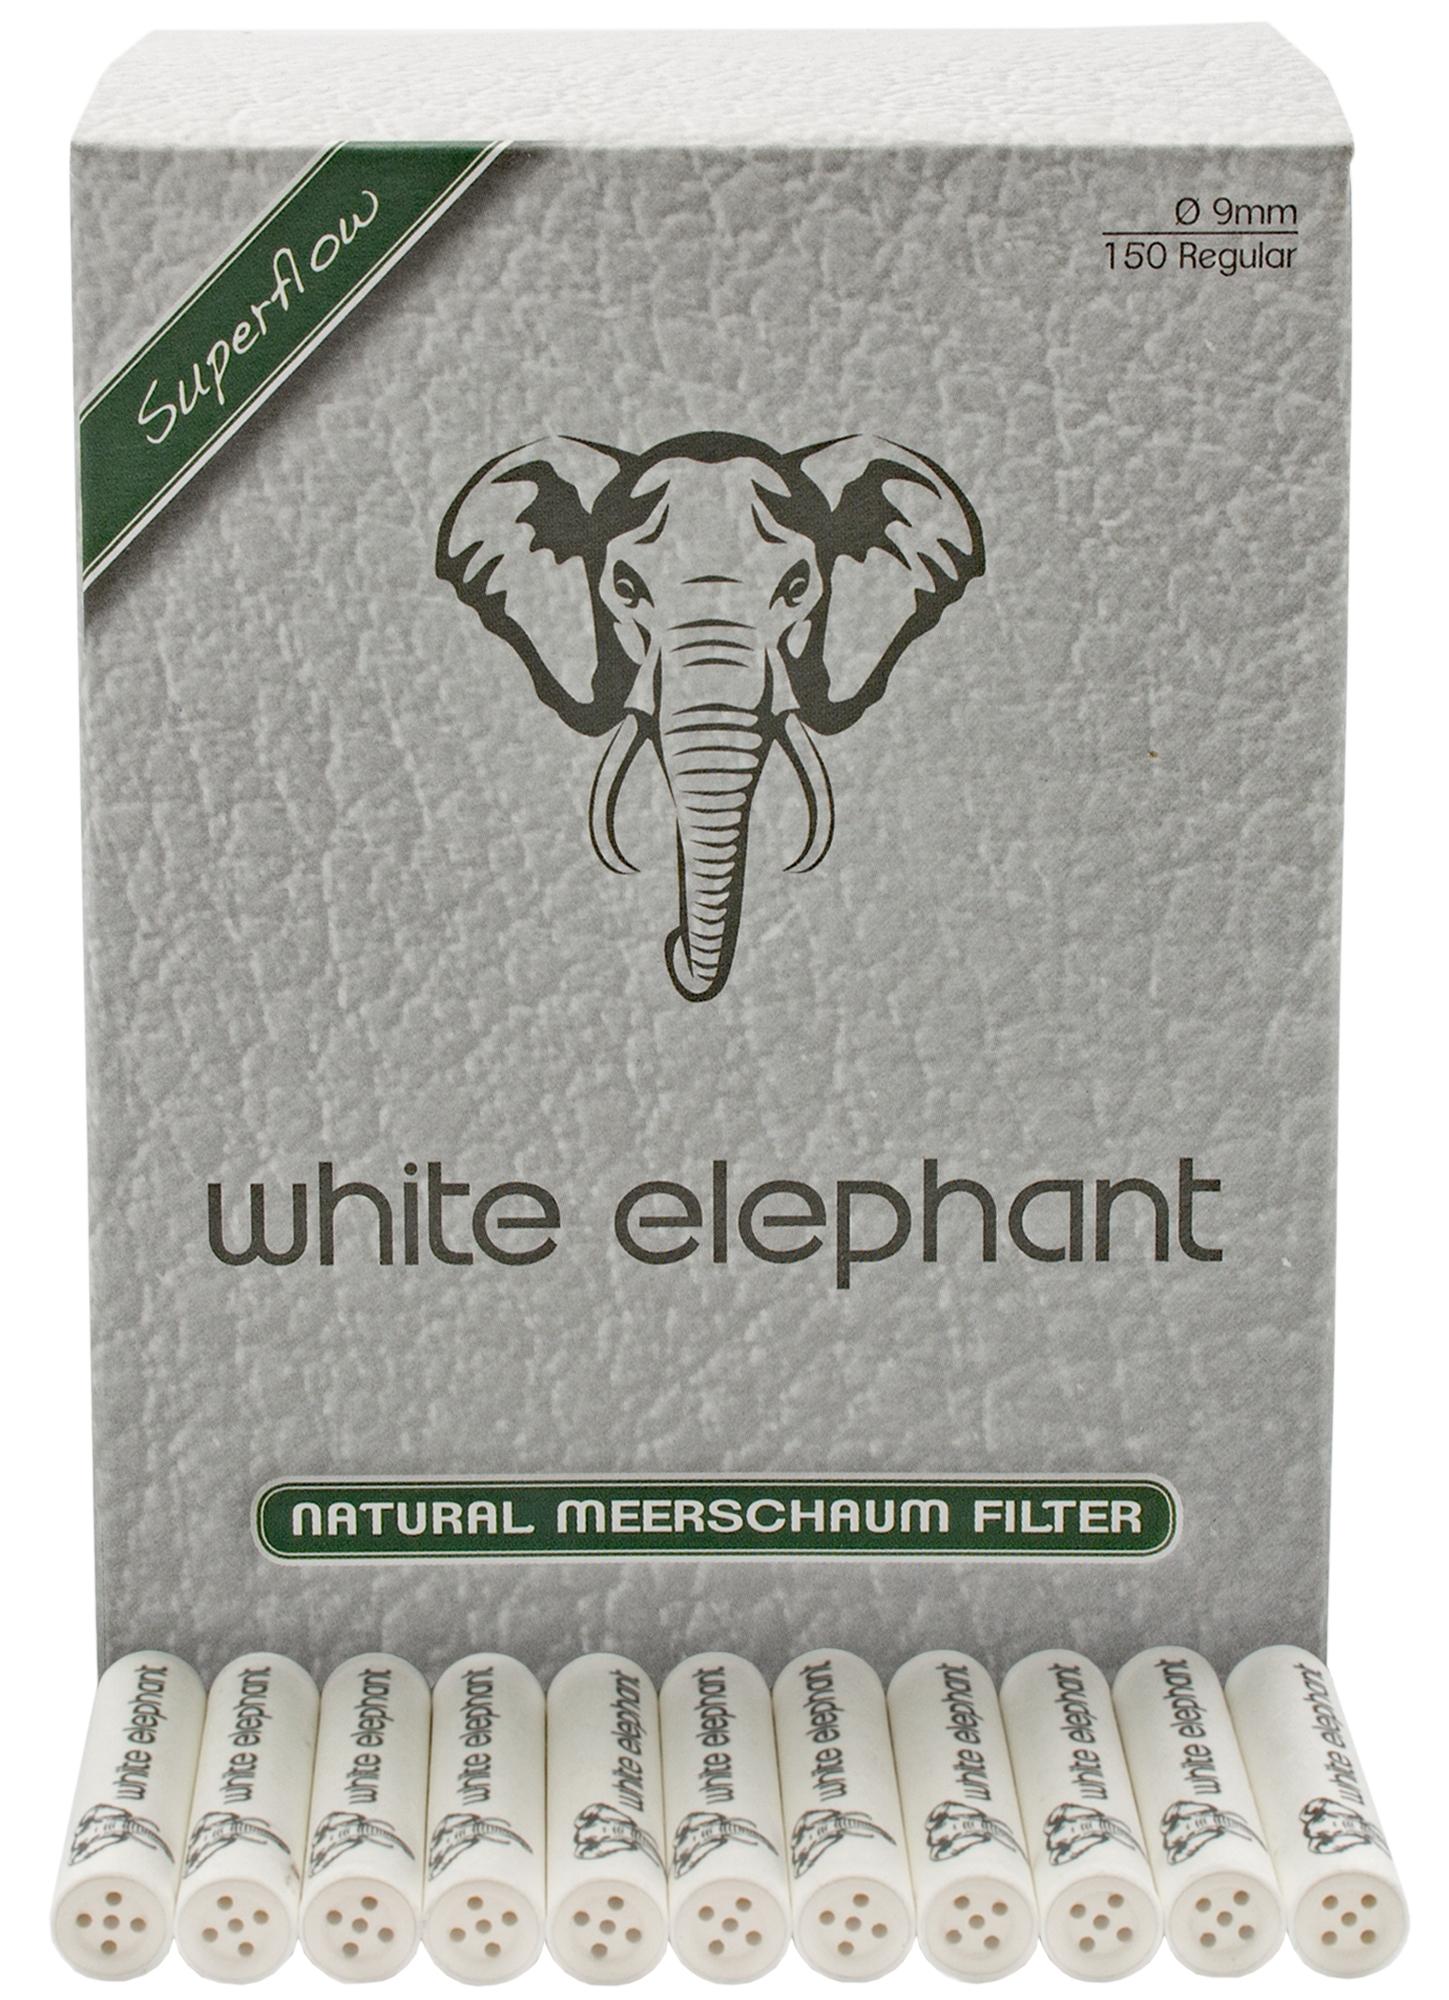 Pfeifenfilter White Elephant 20mm Natural Meerschaum Superflow in 20er Box